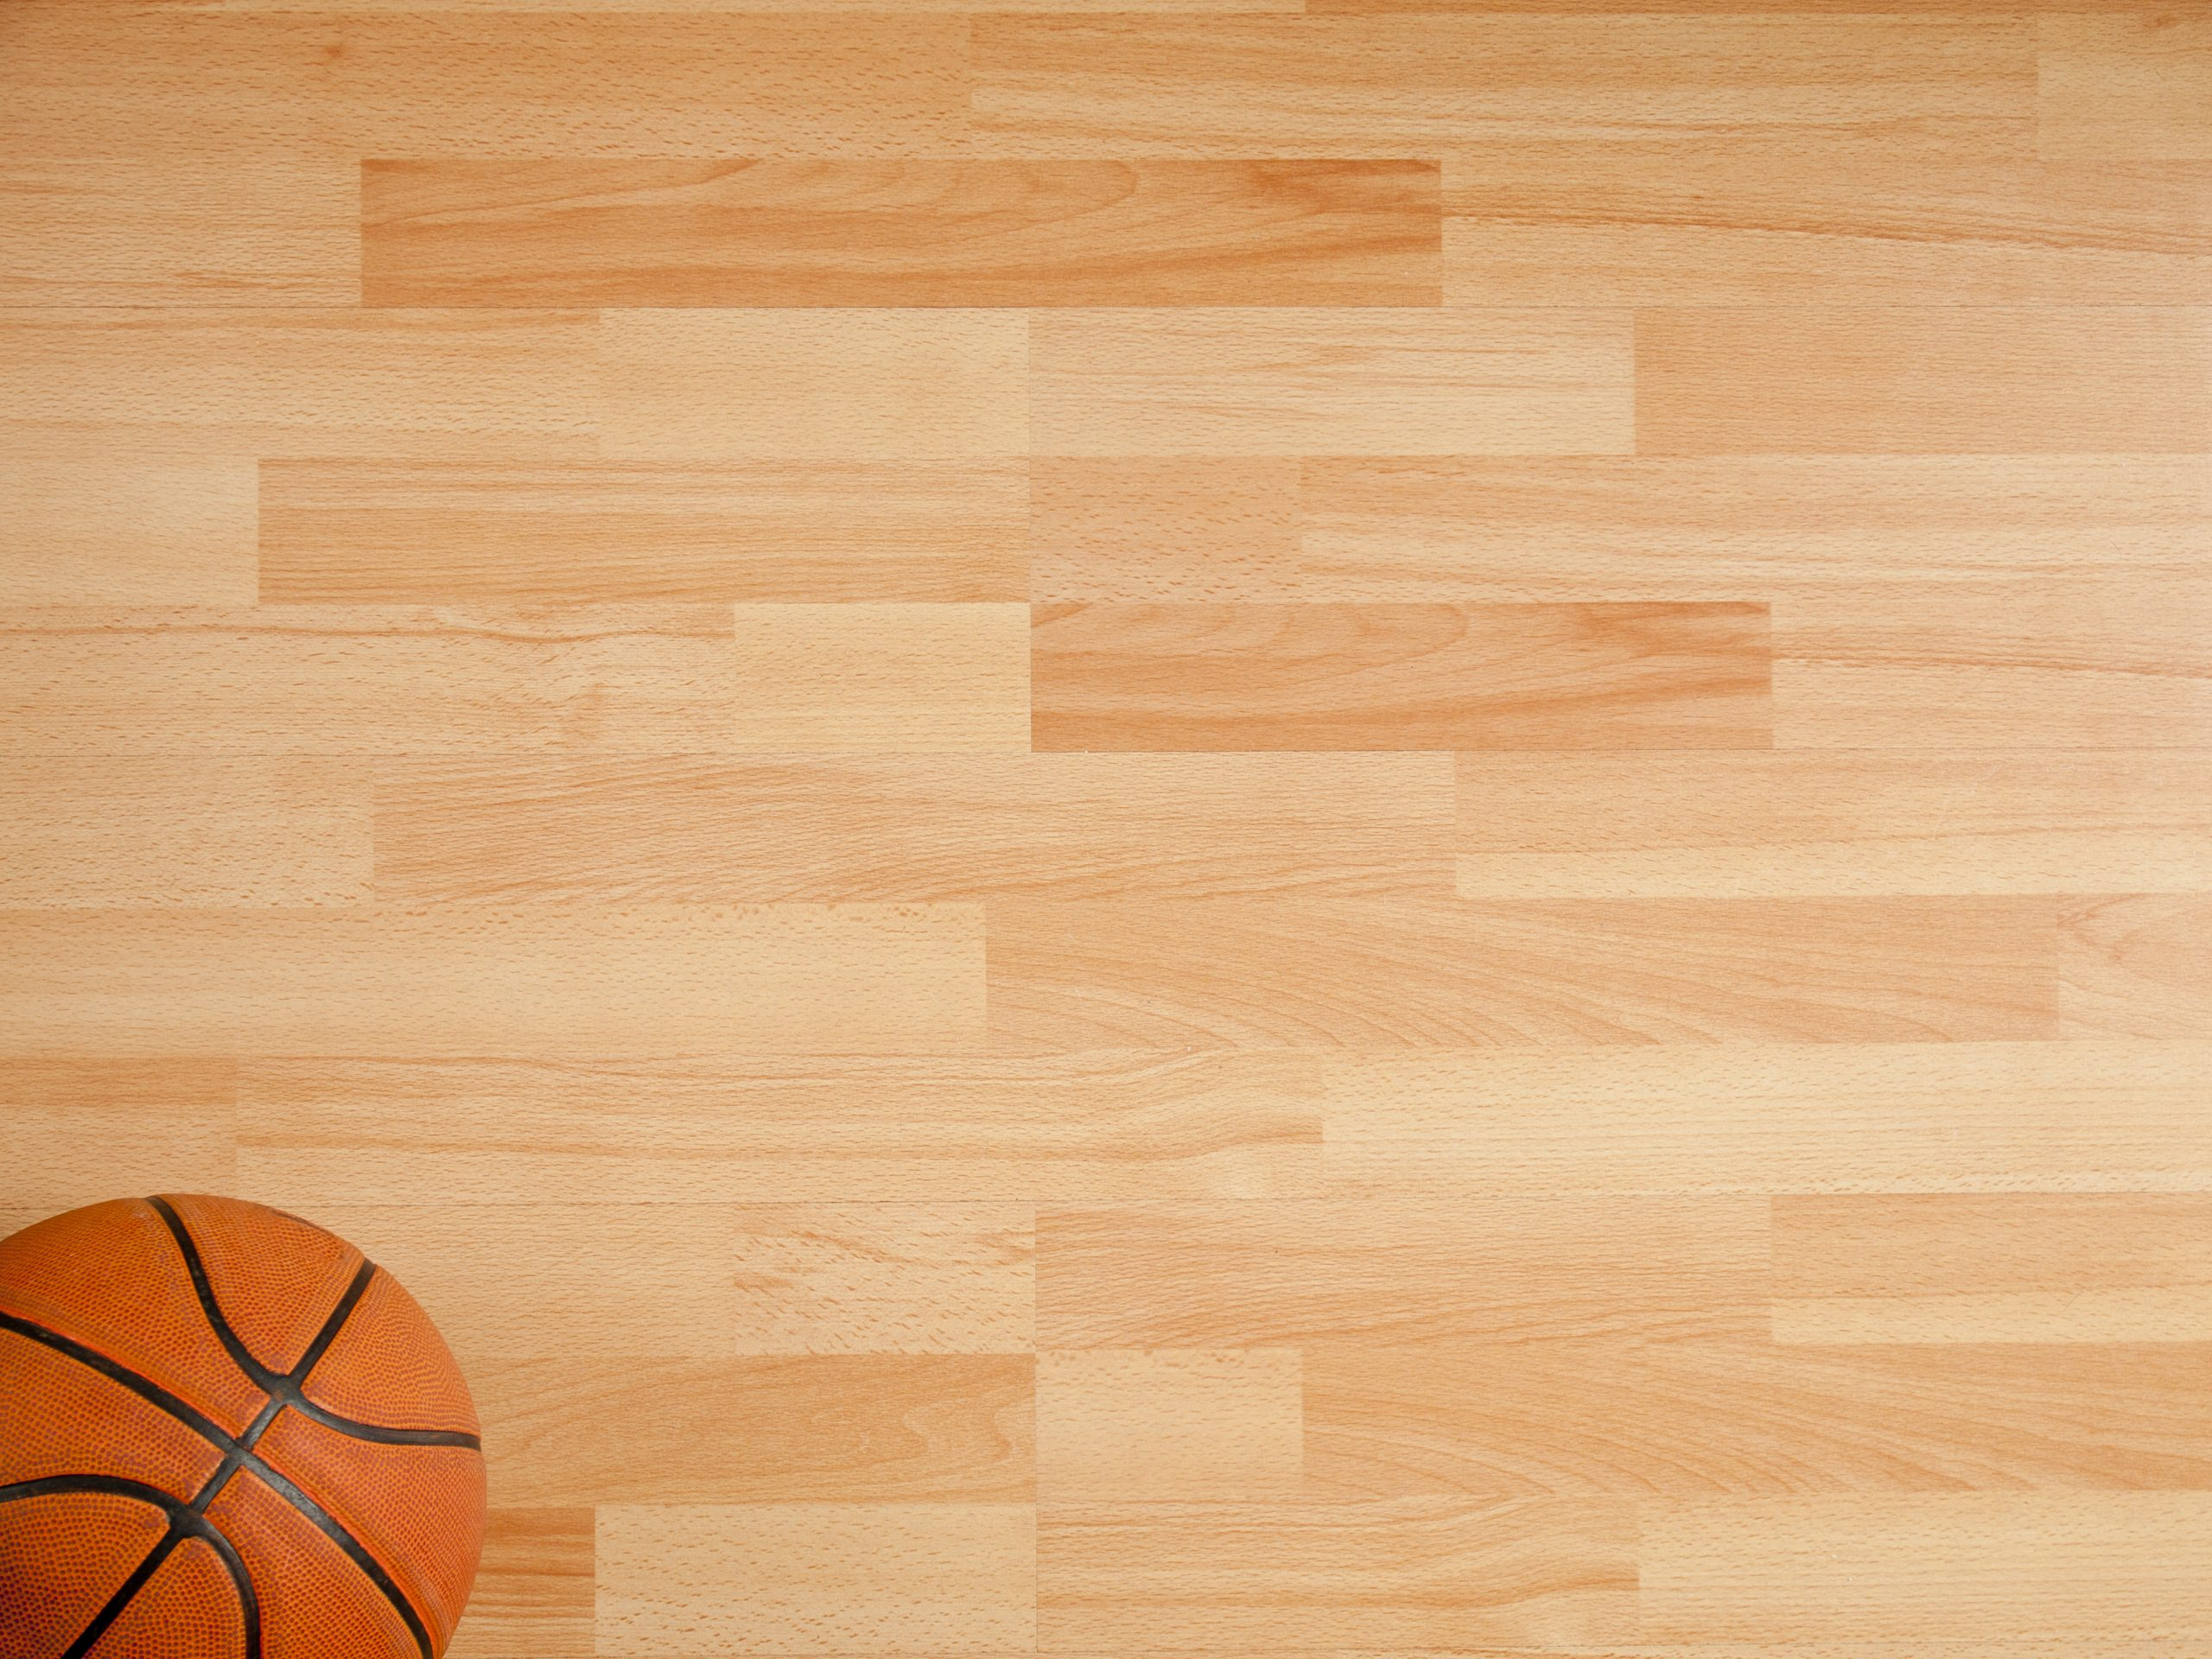 1A/2A Regional Basketball Starts Thursday